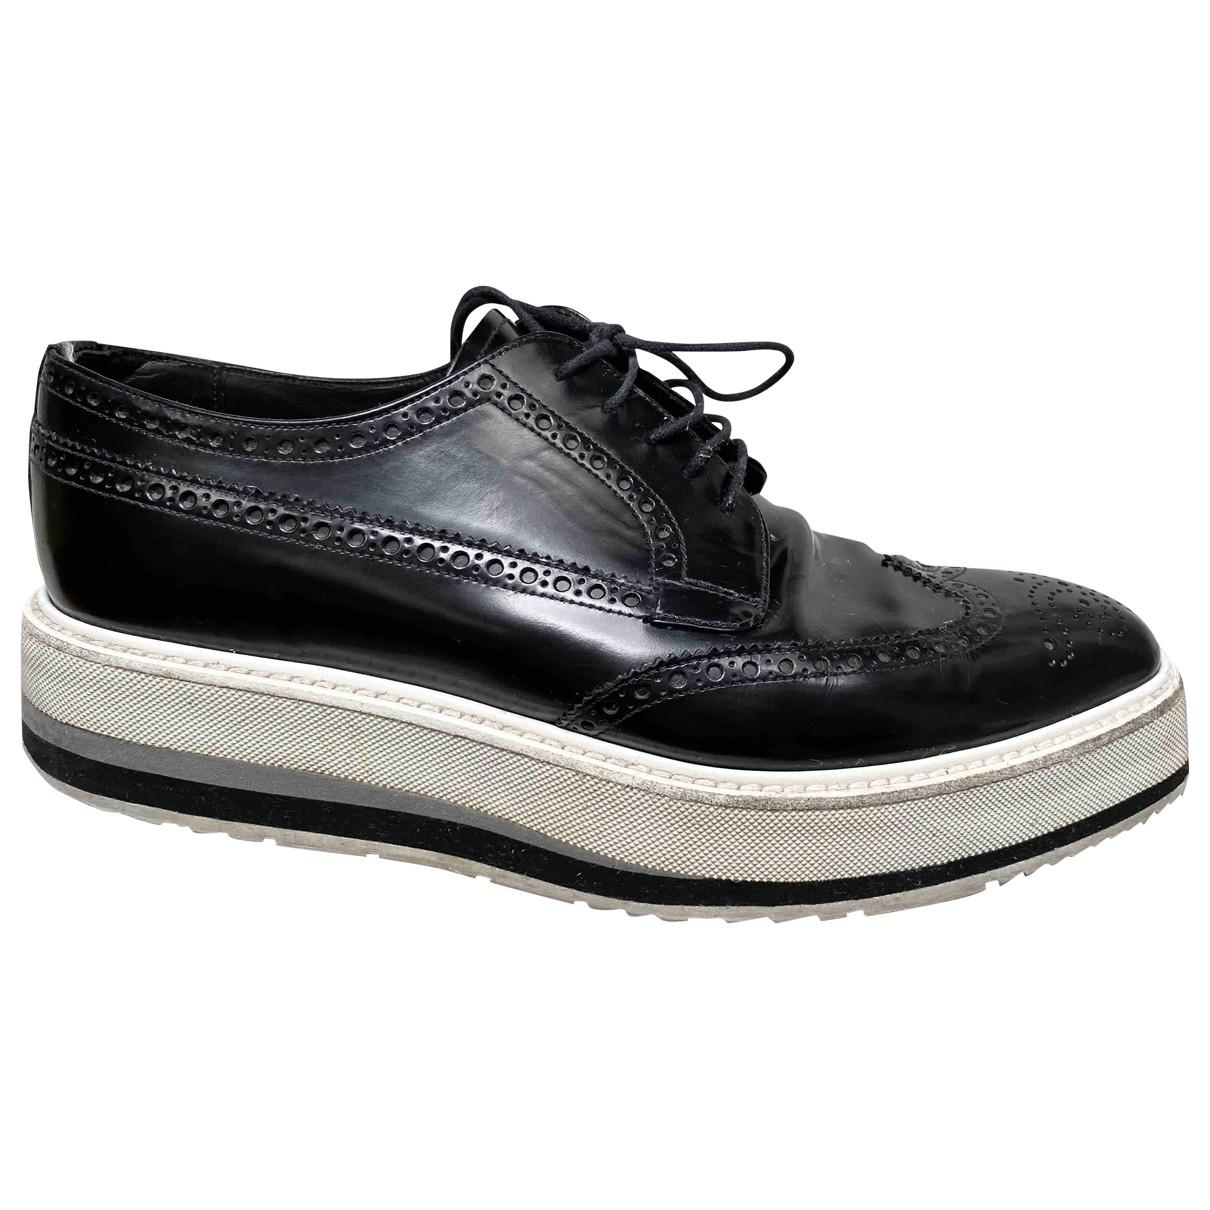 Prada \N Black Leather Lace ups for Men 8 UK